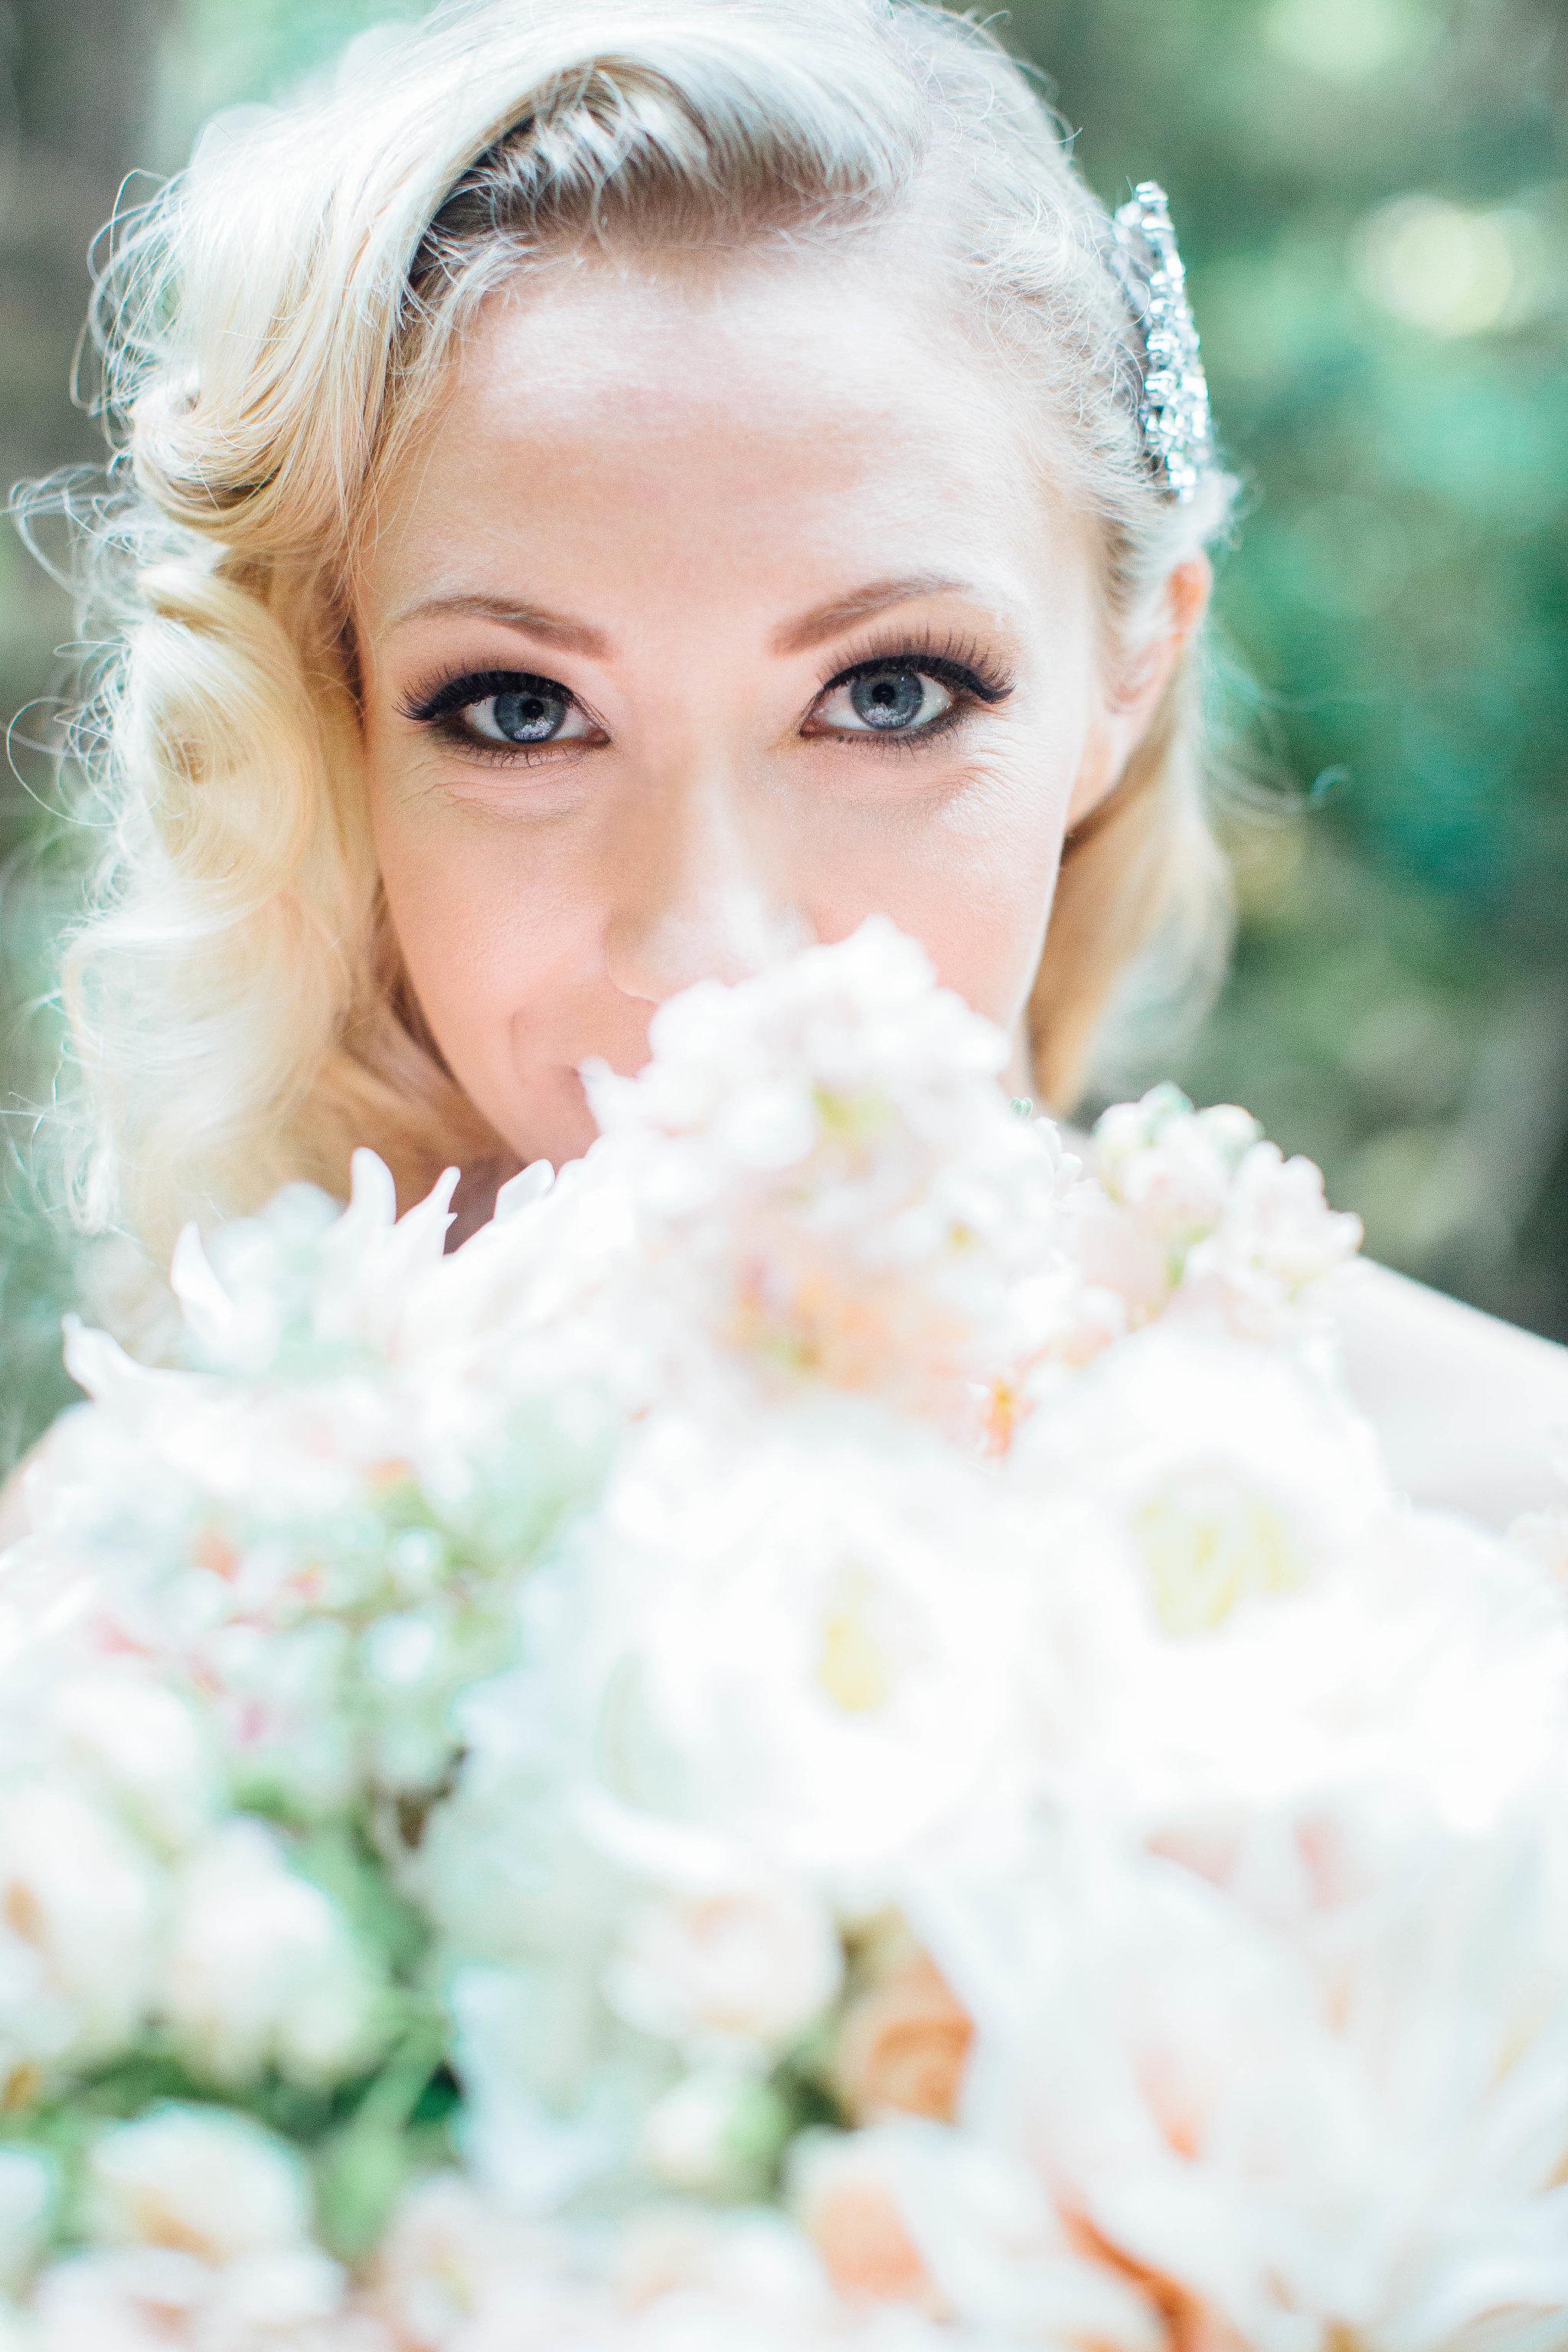 bellingham-wedding-backayard-by-seattle-wedding-photographer-adina-preston-21.jpg